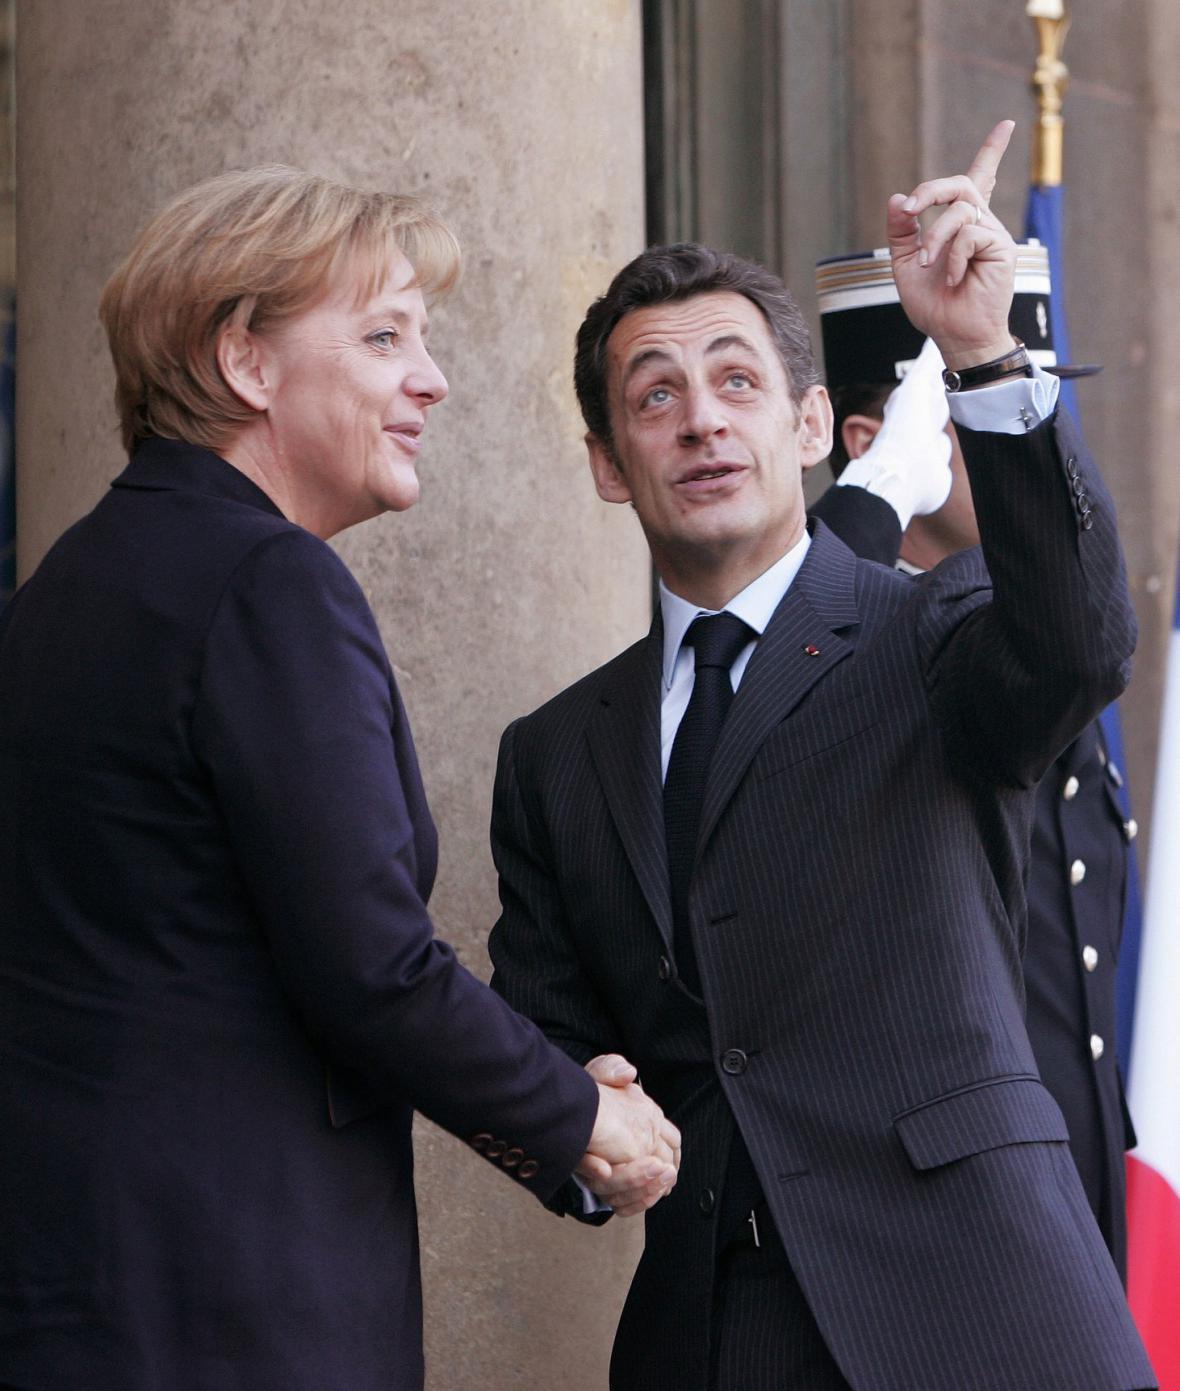 Angela Merkelová na návštěvě u Nicolase Sarkozyho